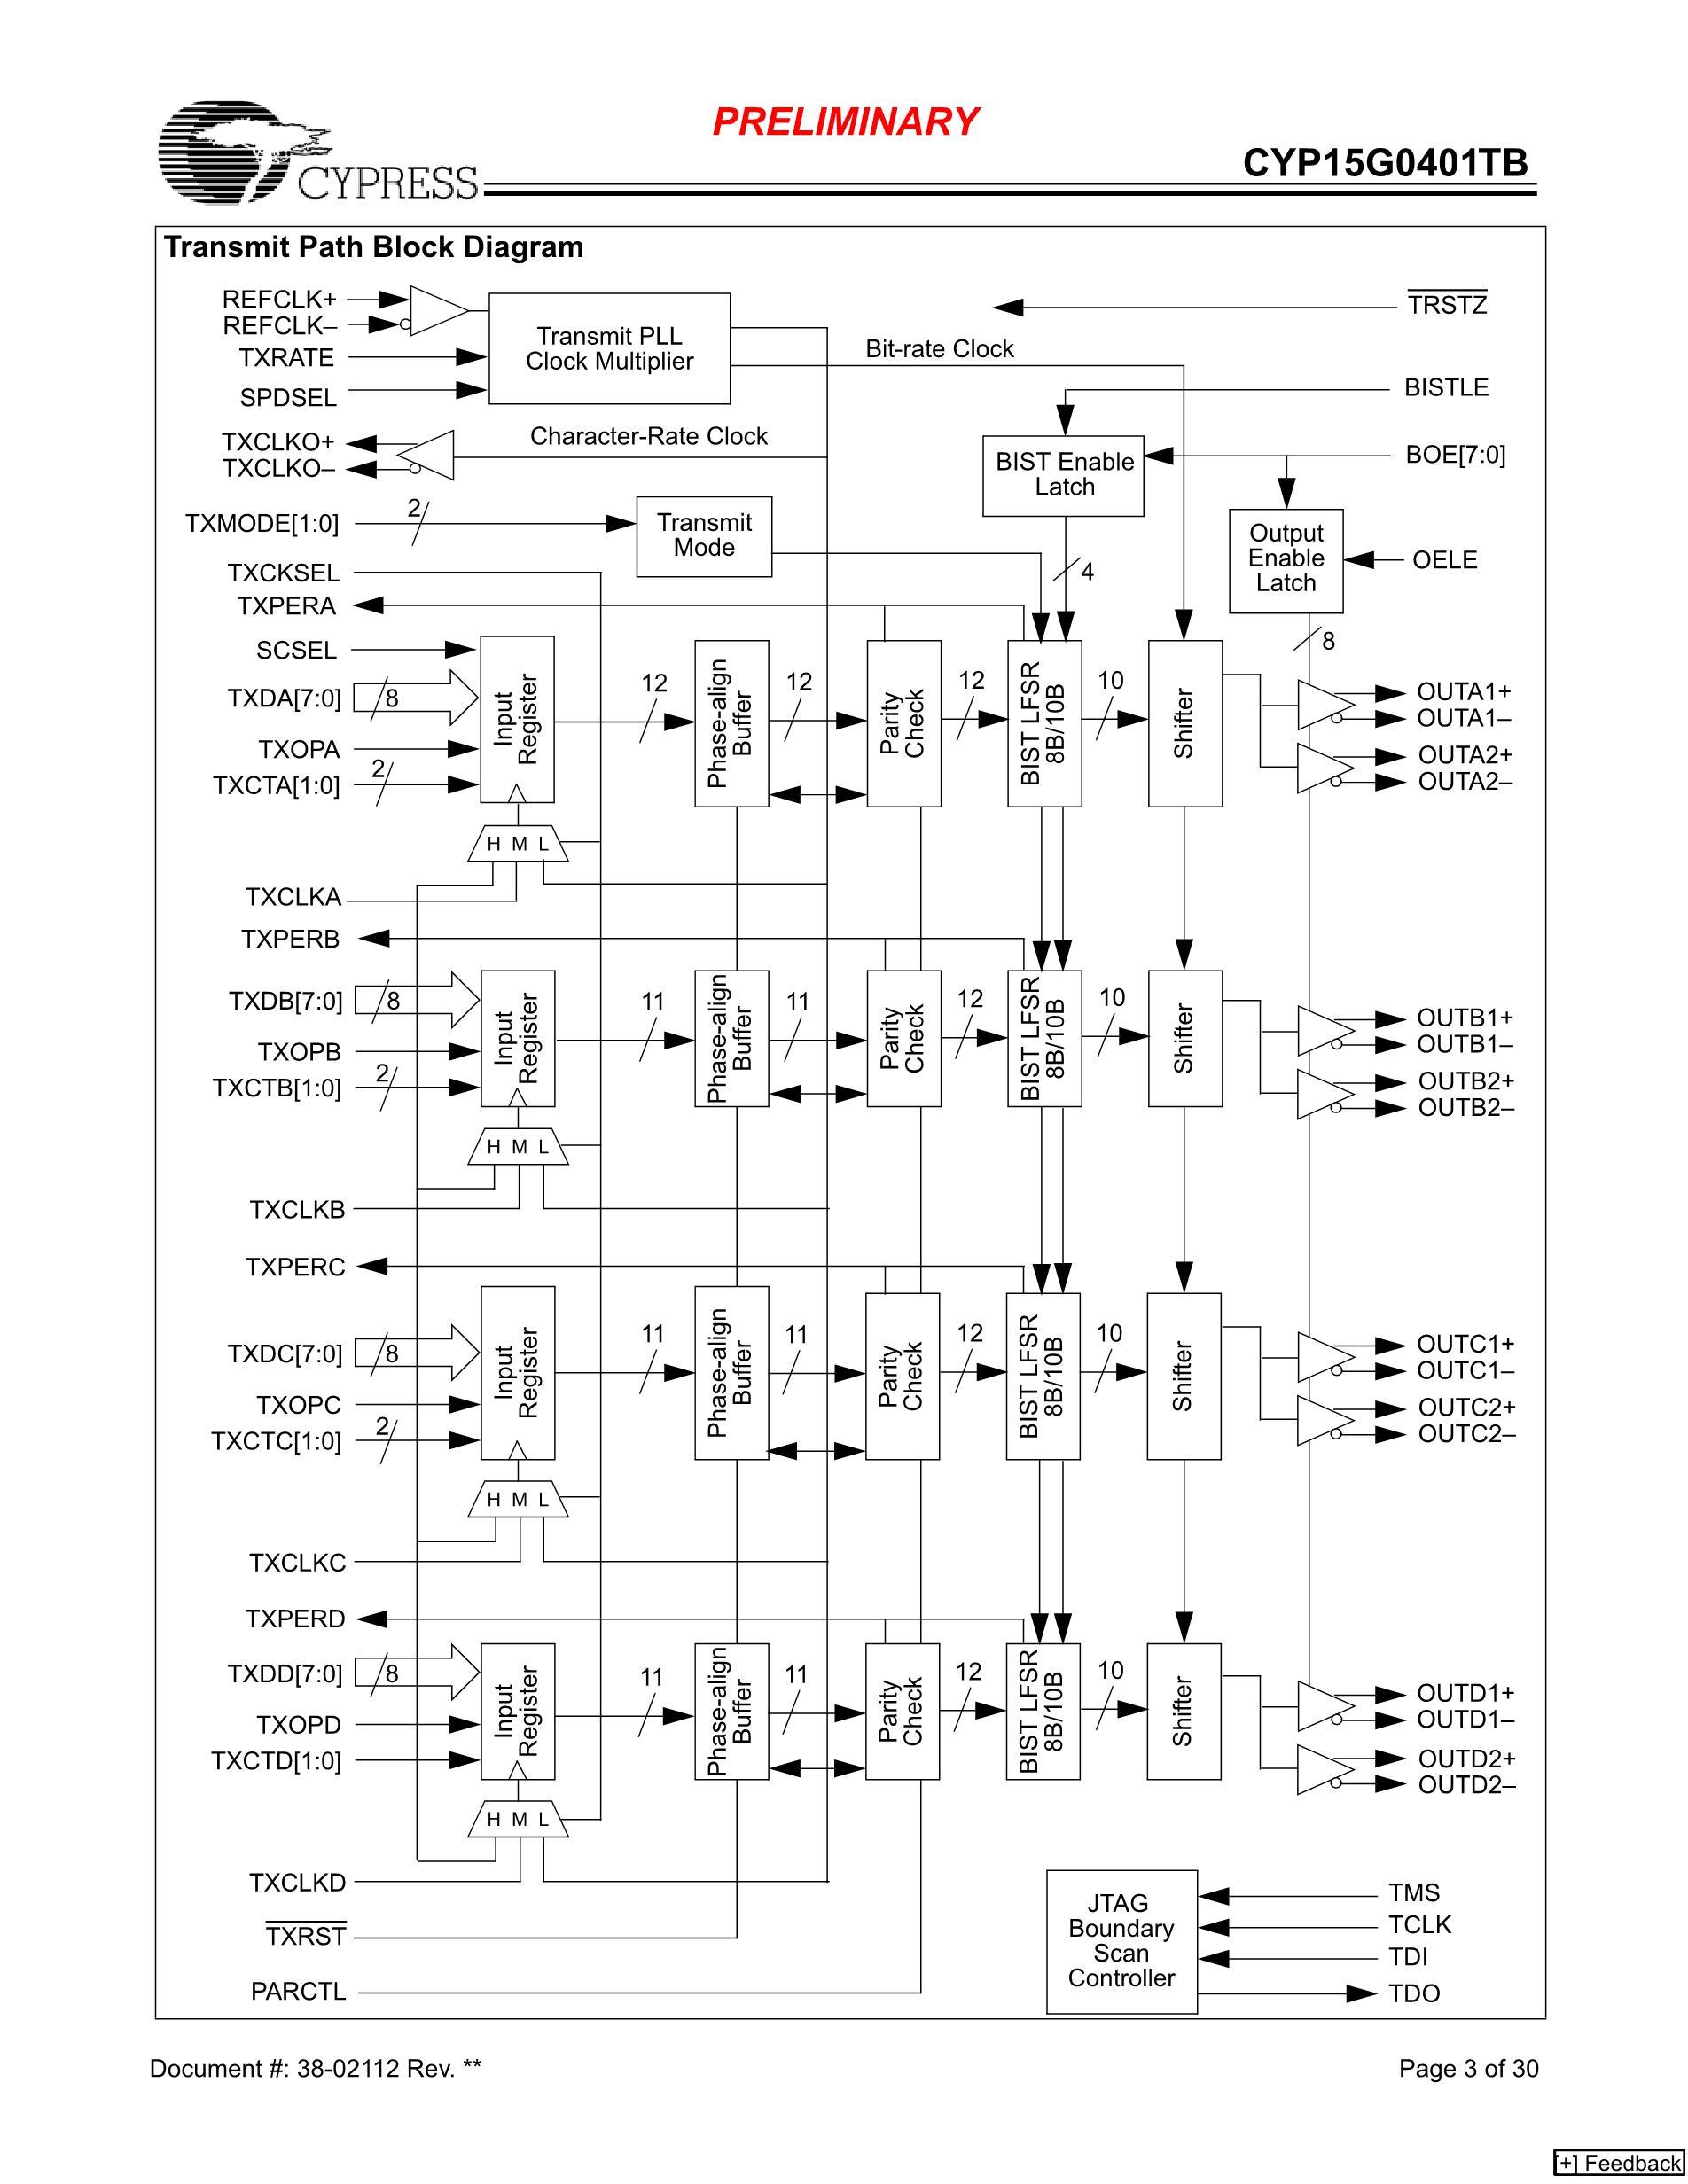 CYP15G0401RB-BGC's pdf picture 3